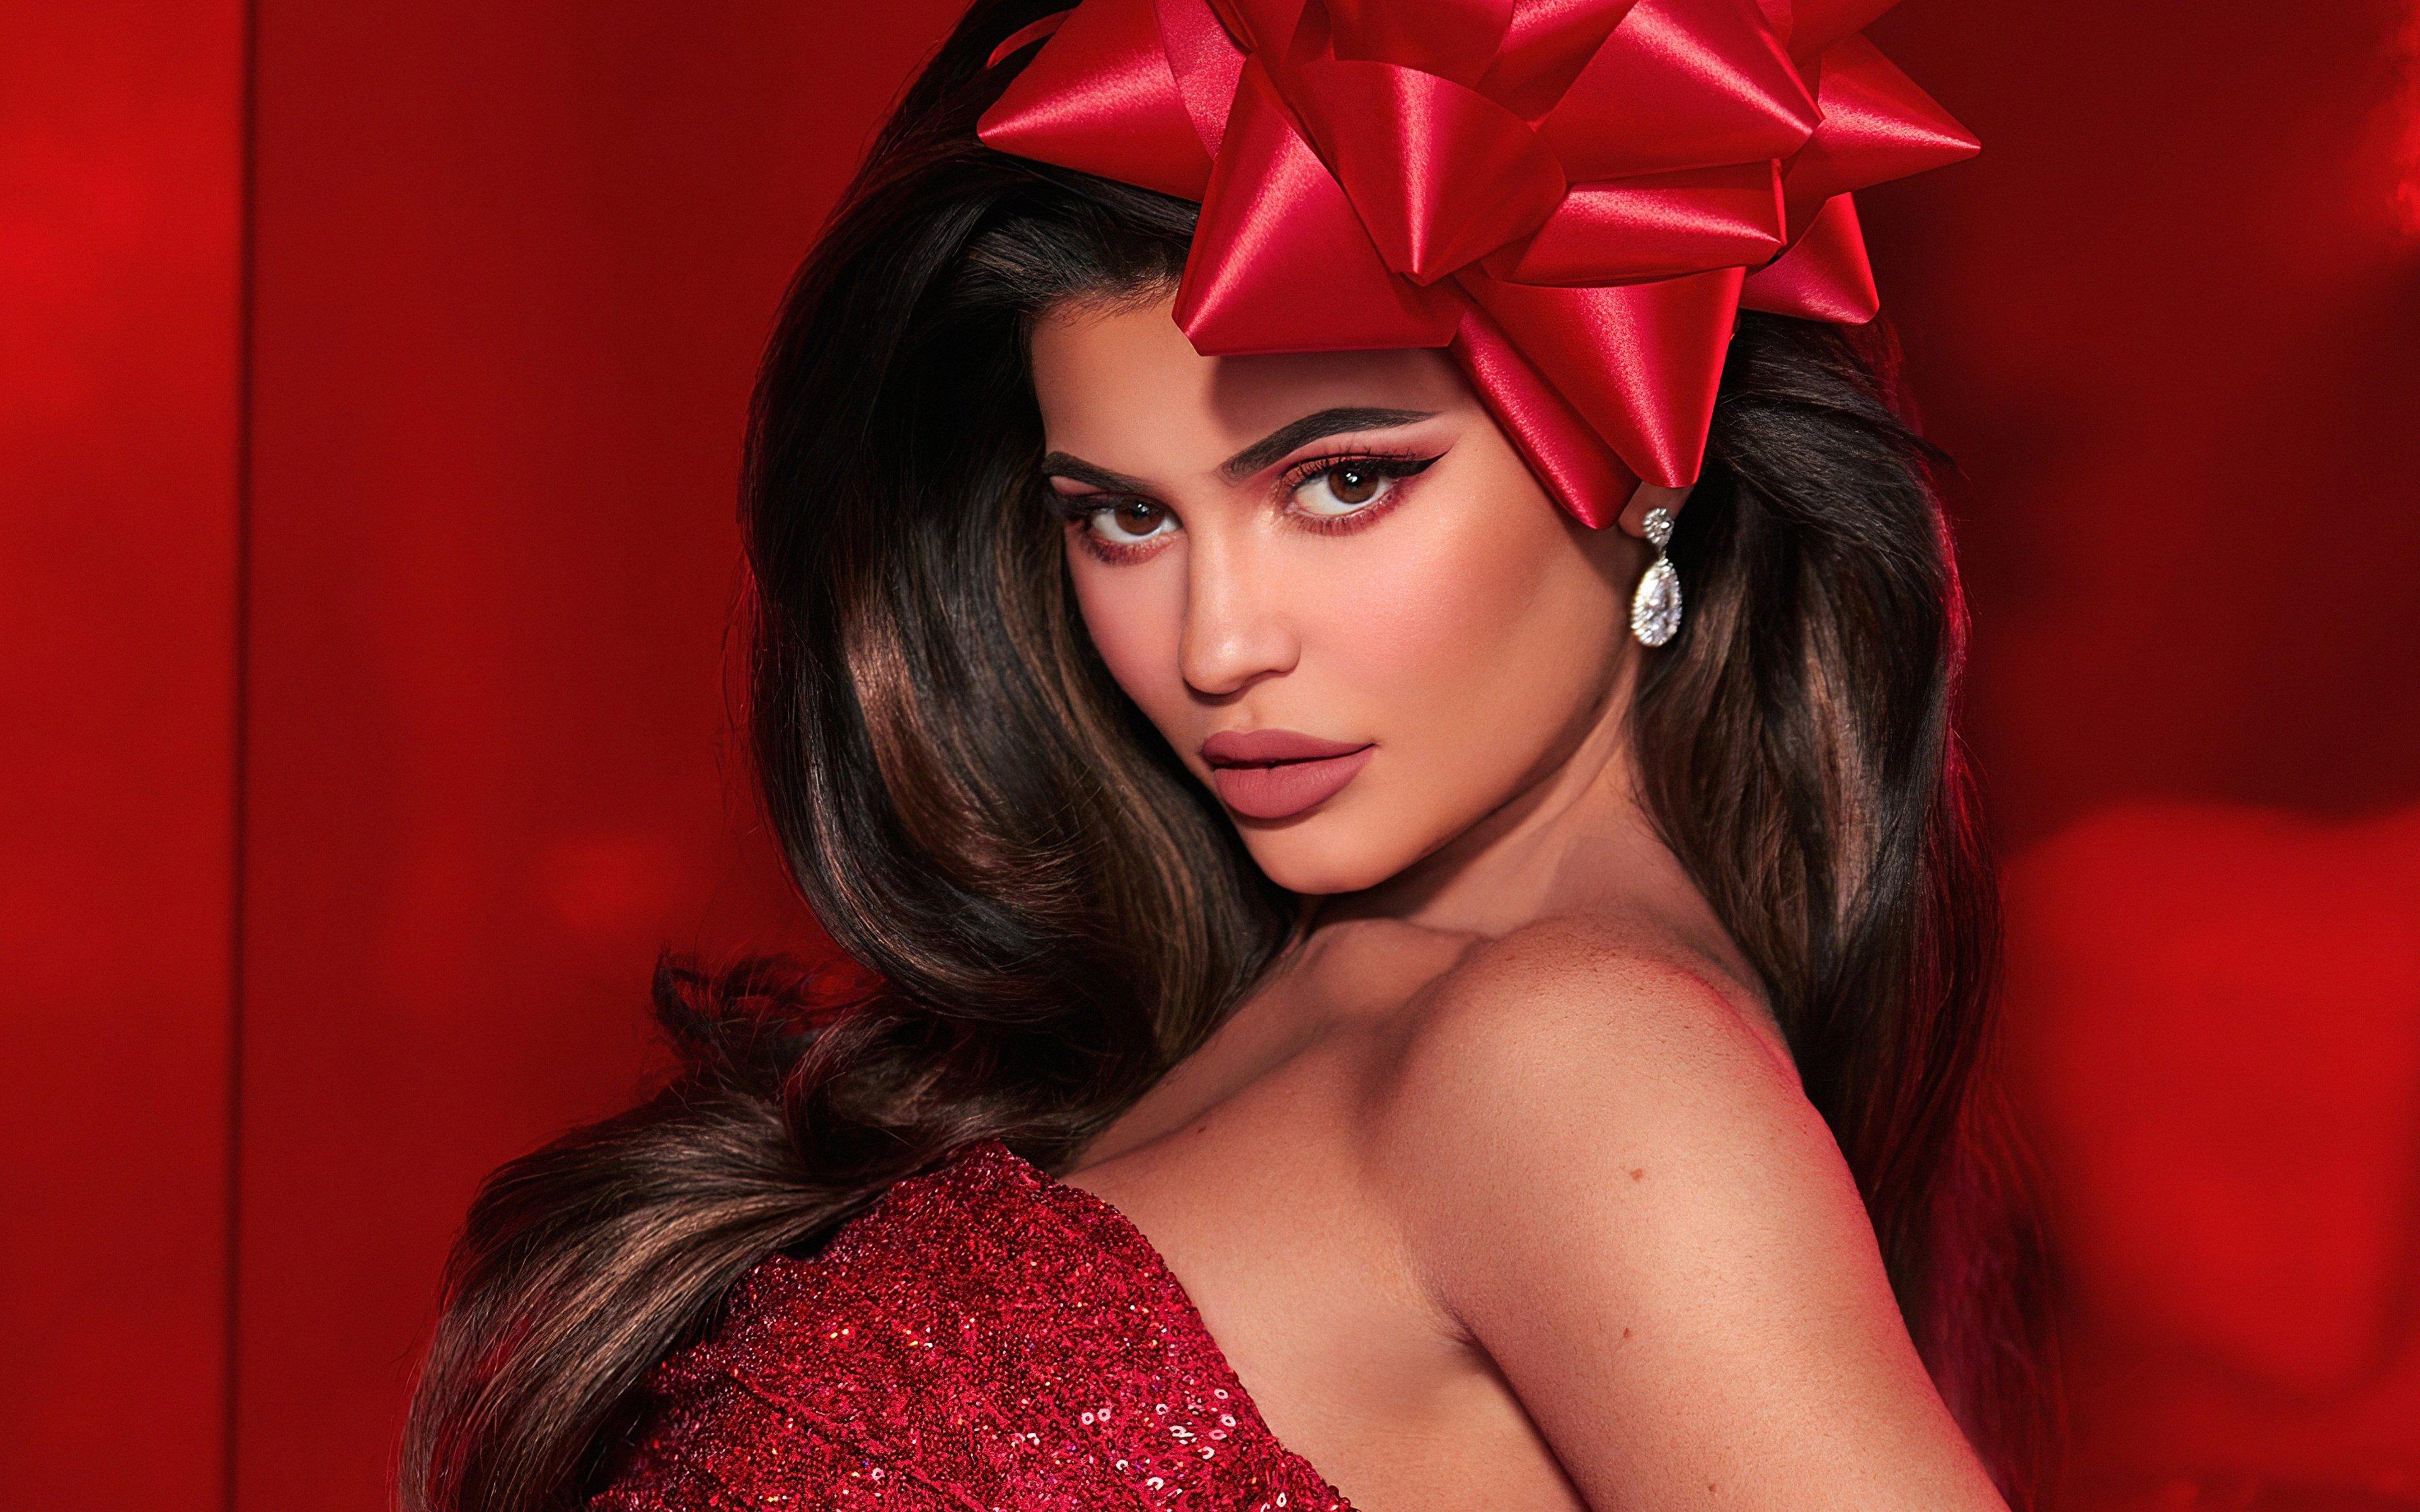 Fondos de pantalla Kylie Jenner en Navidad